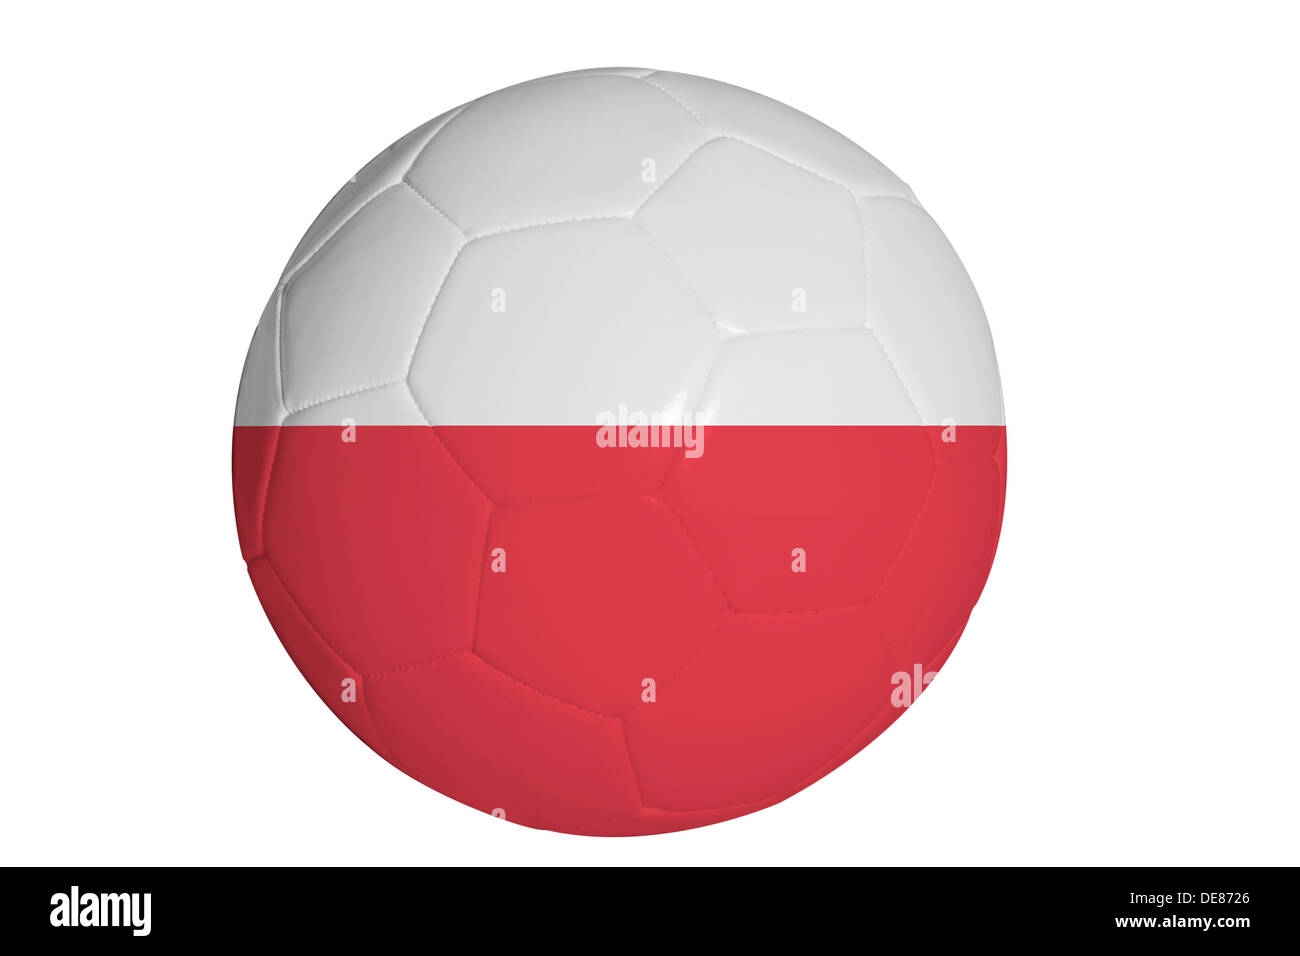 polish flag graphic on soccer ball stock photo royalty free image